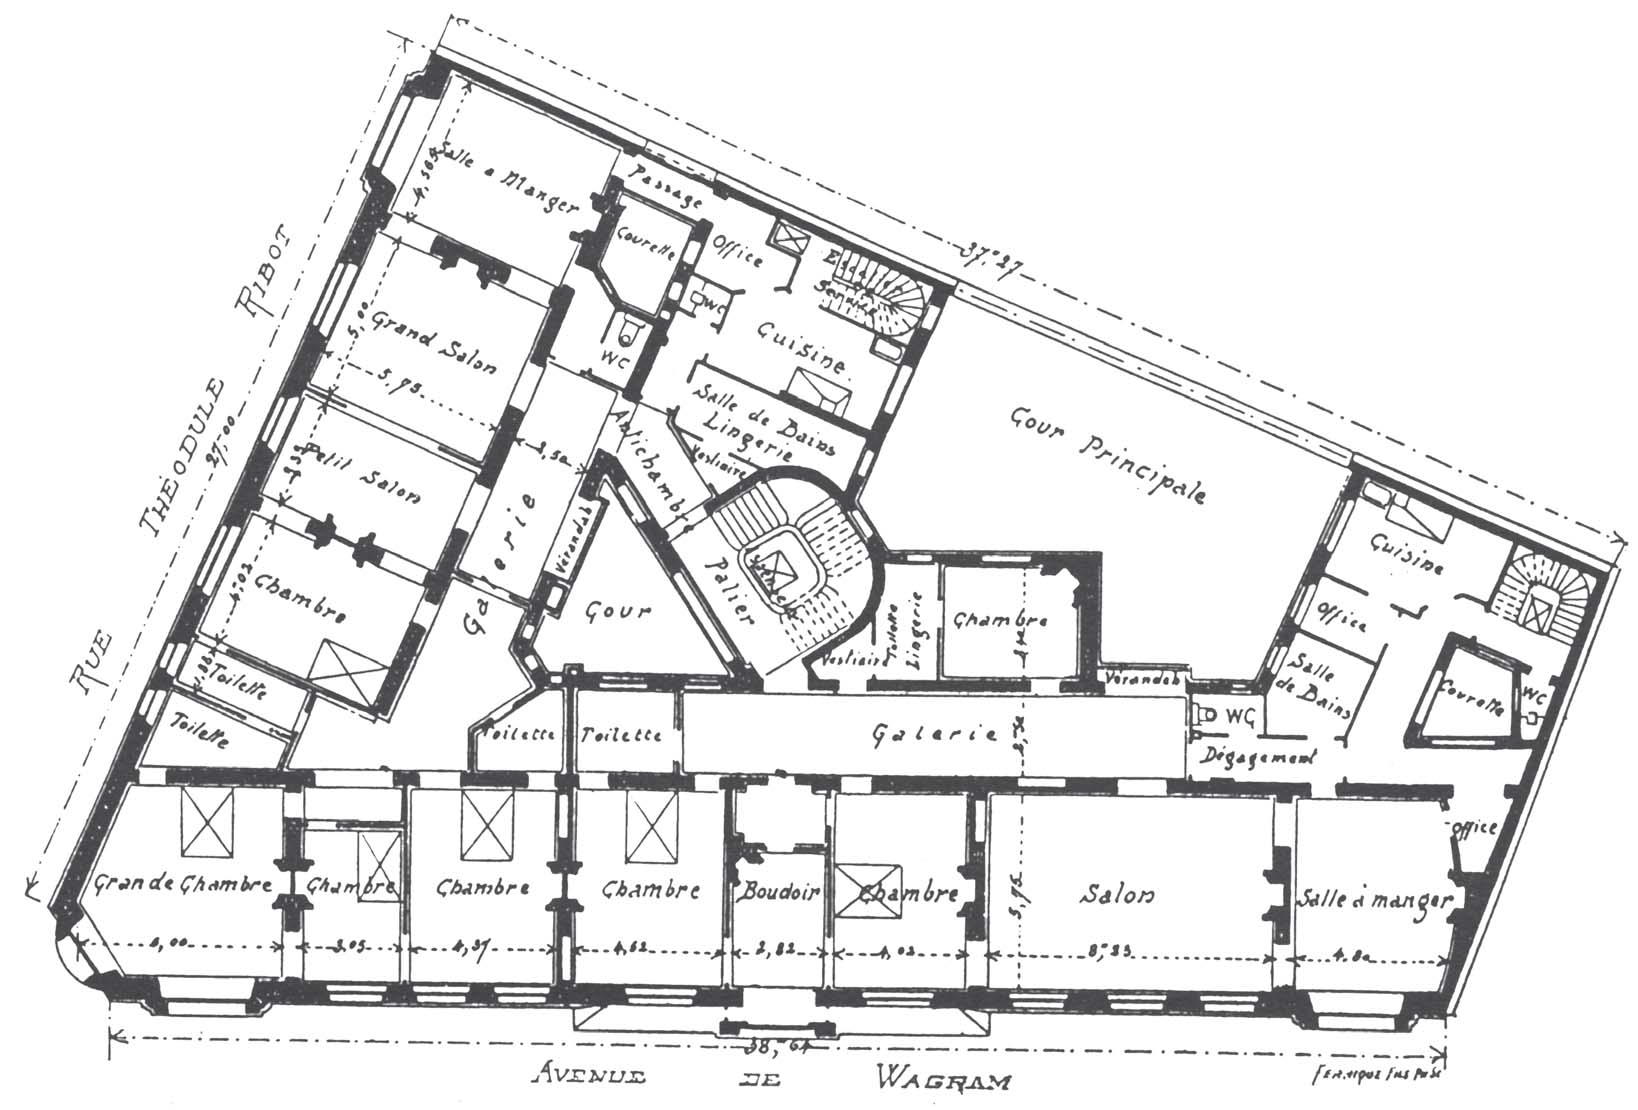 Plan maison original modle original maison chambres - Plan de maison original ...